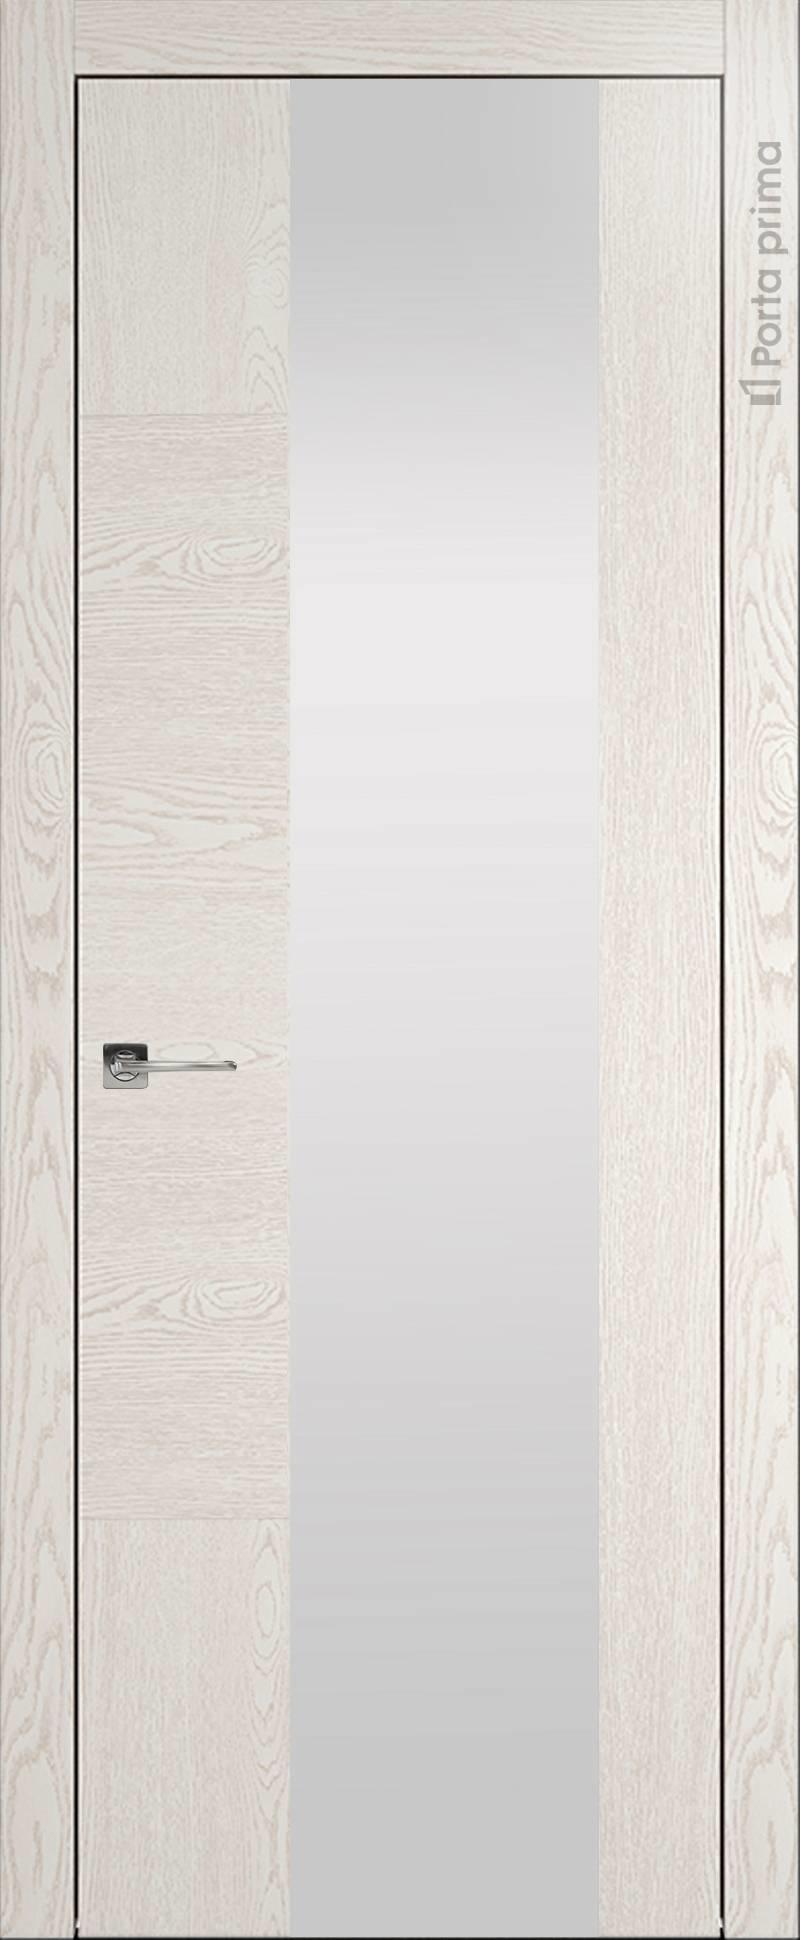 Tivoli Е-1 цвет - Белый ясень (nano-flex) Со стеклом (ДО)